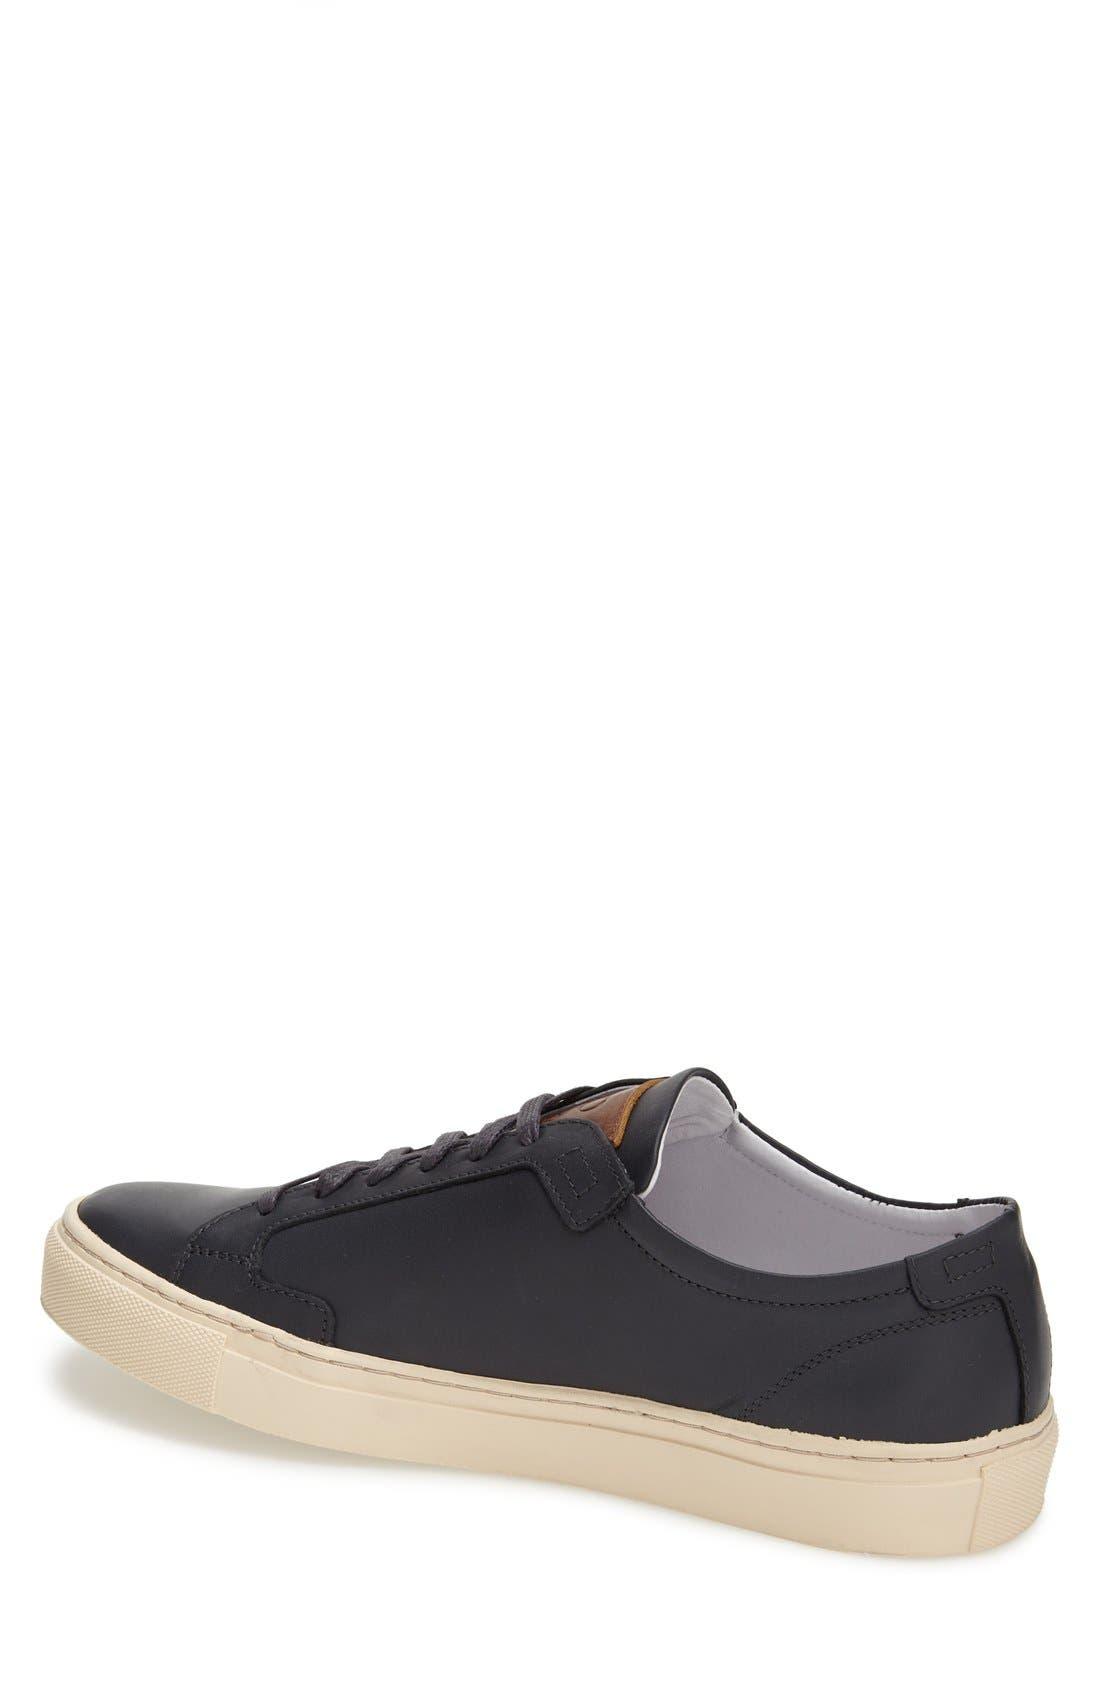 PIOLA,                             'Ica' Sneaker,                             Alternate thumbnail 3, color,                             029